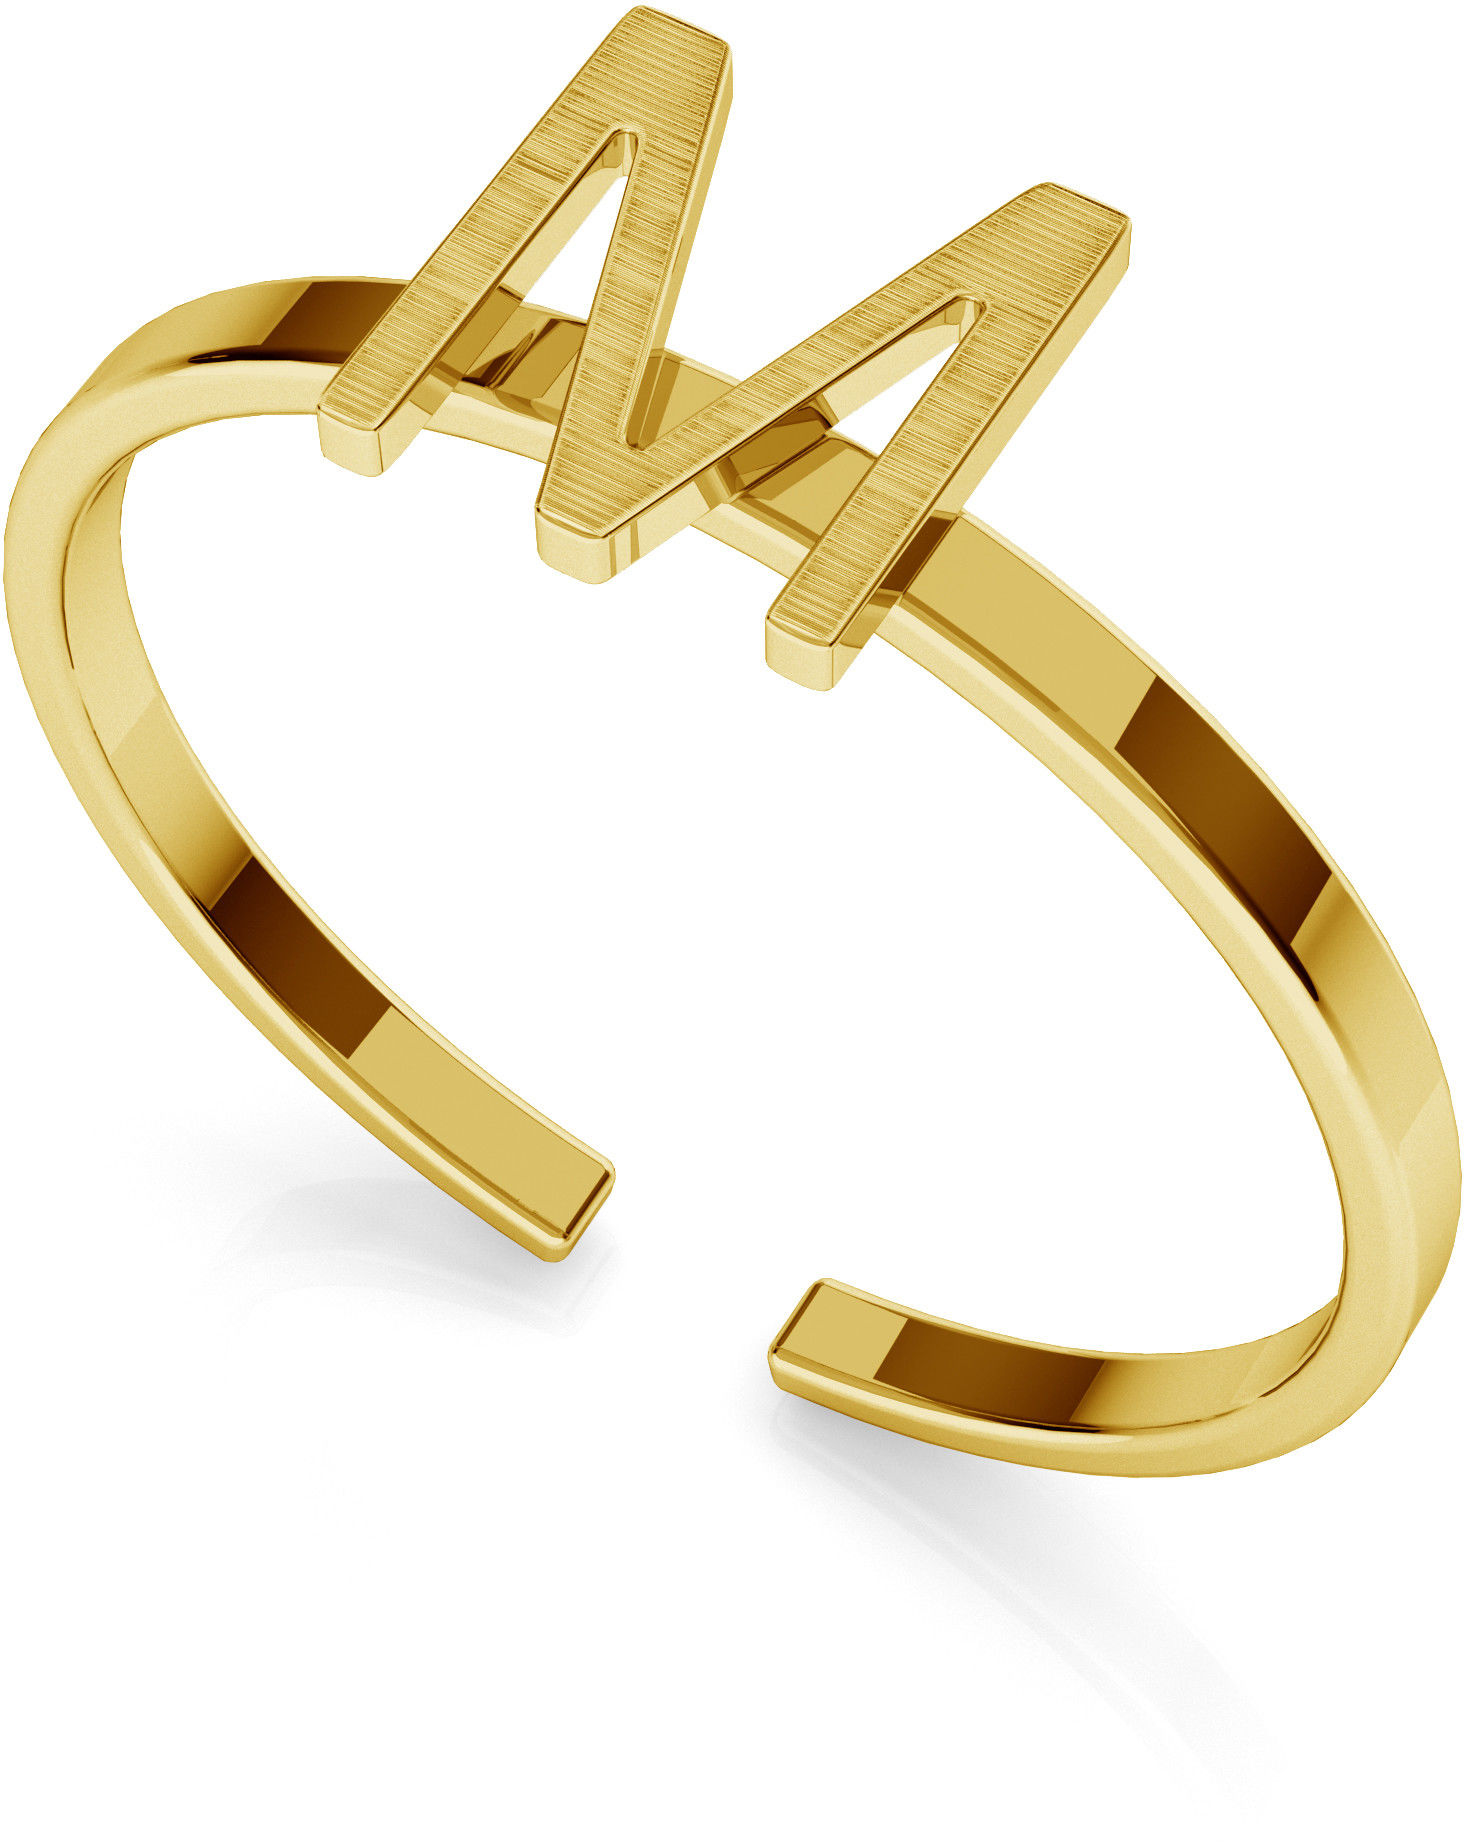 Srebrny pierścionek z literką My RING, srebro 925 : Litera - C, Srebro - kolor pokrycia - Pokrycie platyną